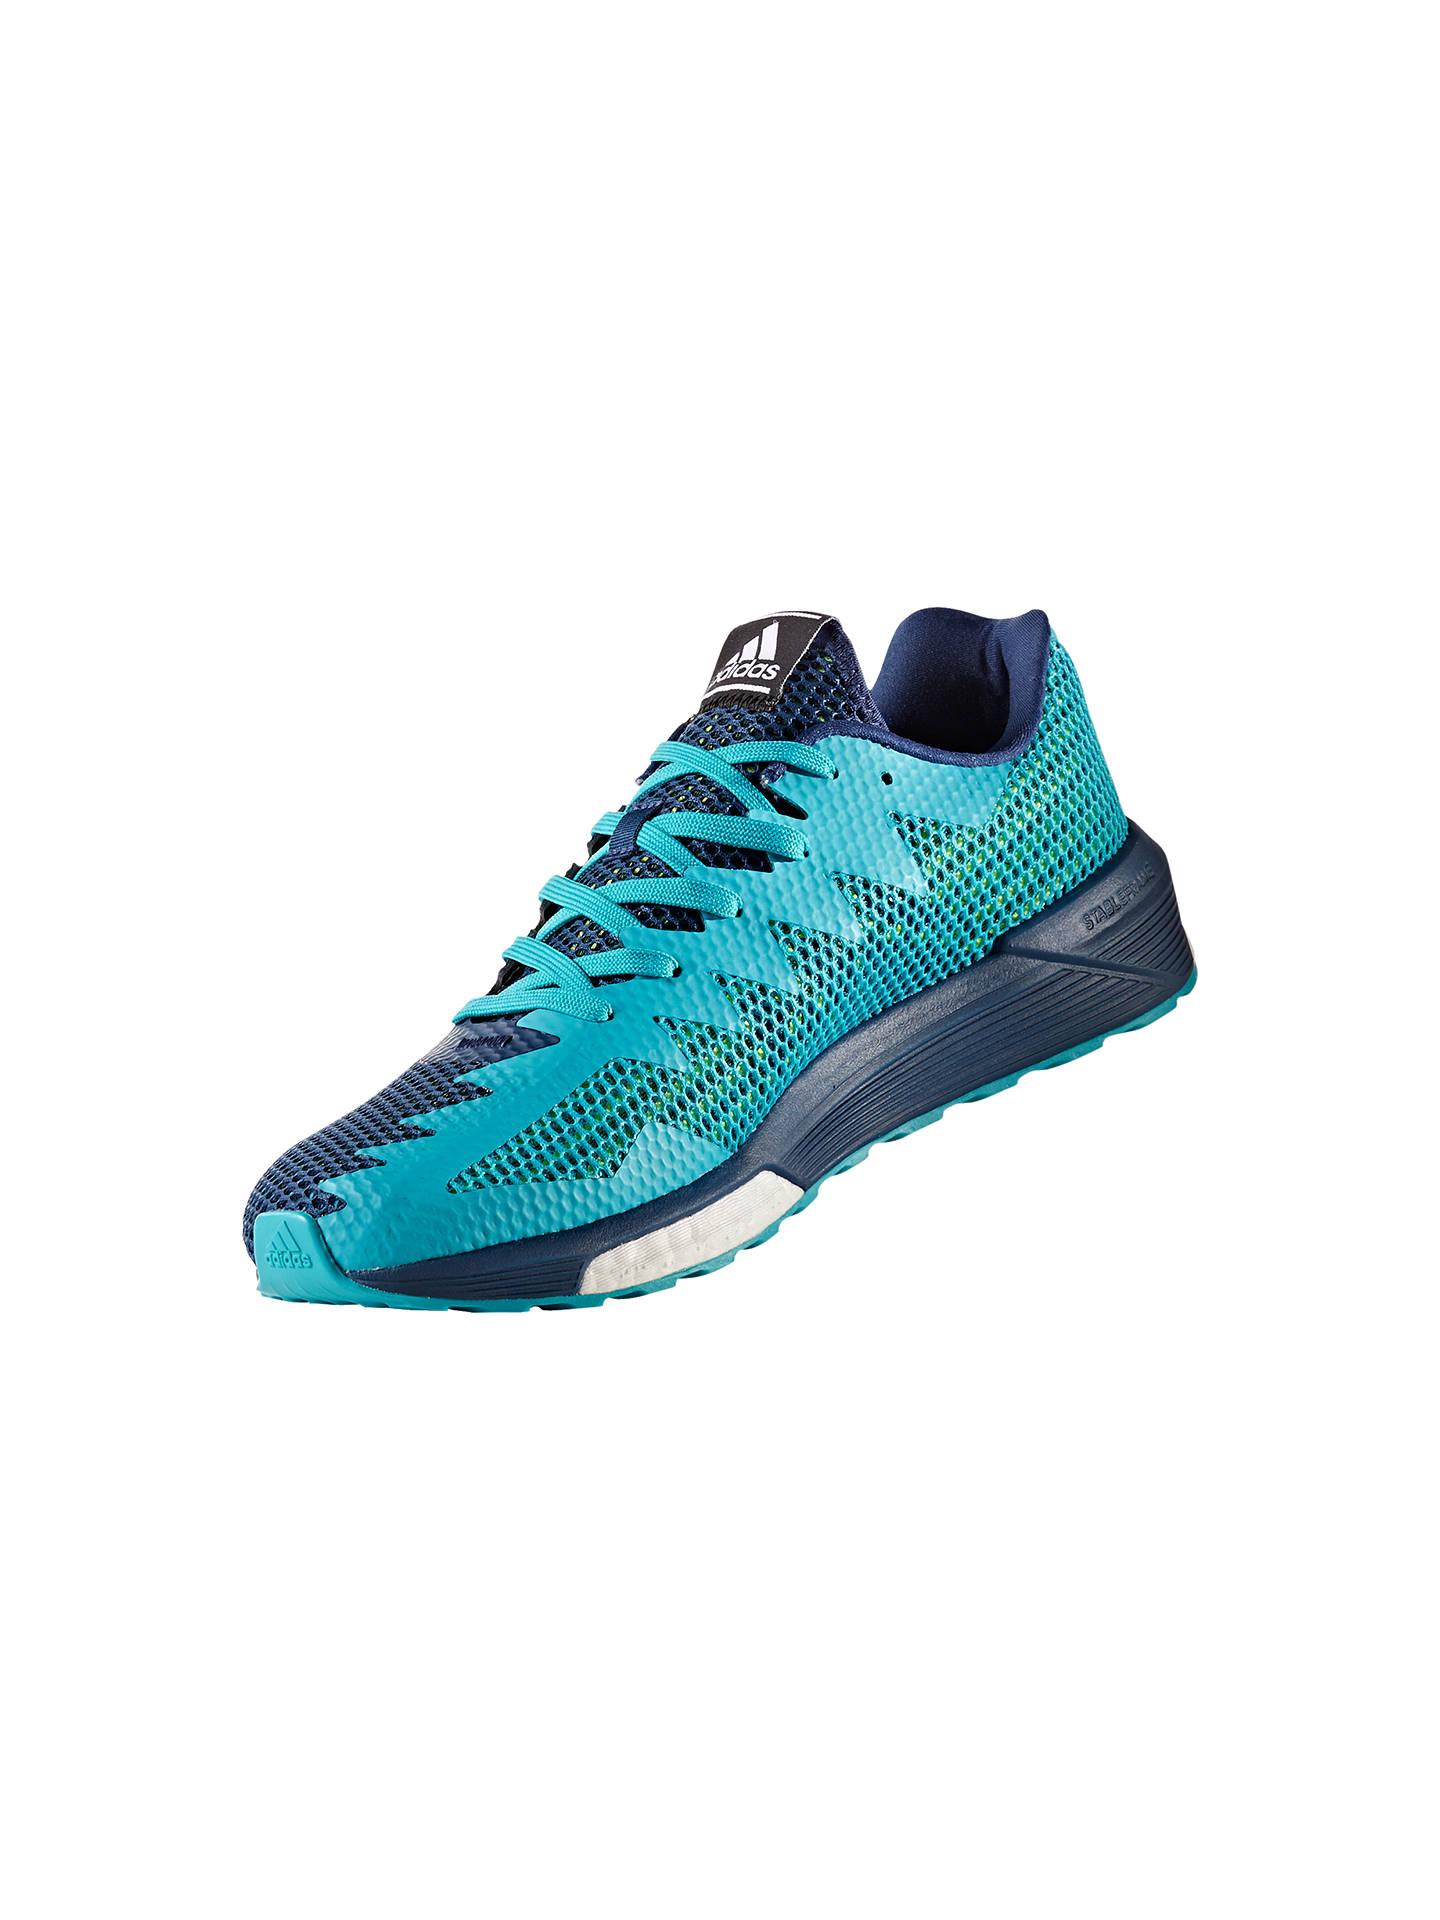 timeless design 5480d 5e746 adidas Vengeful Men's Running Shoes, Blue at John Lewis ...